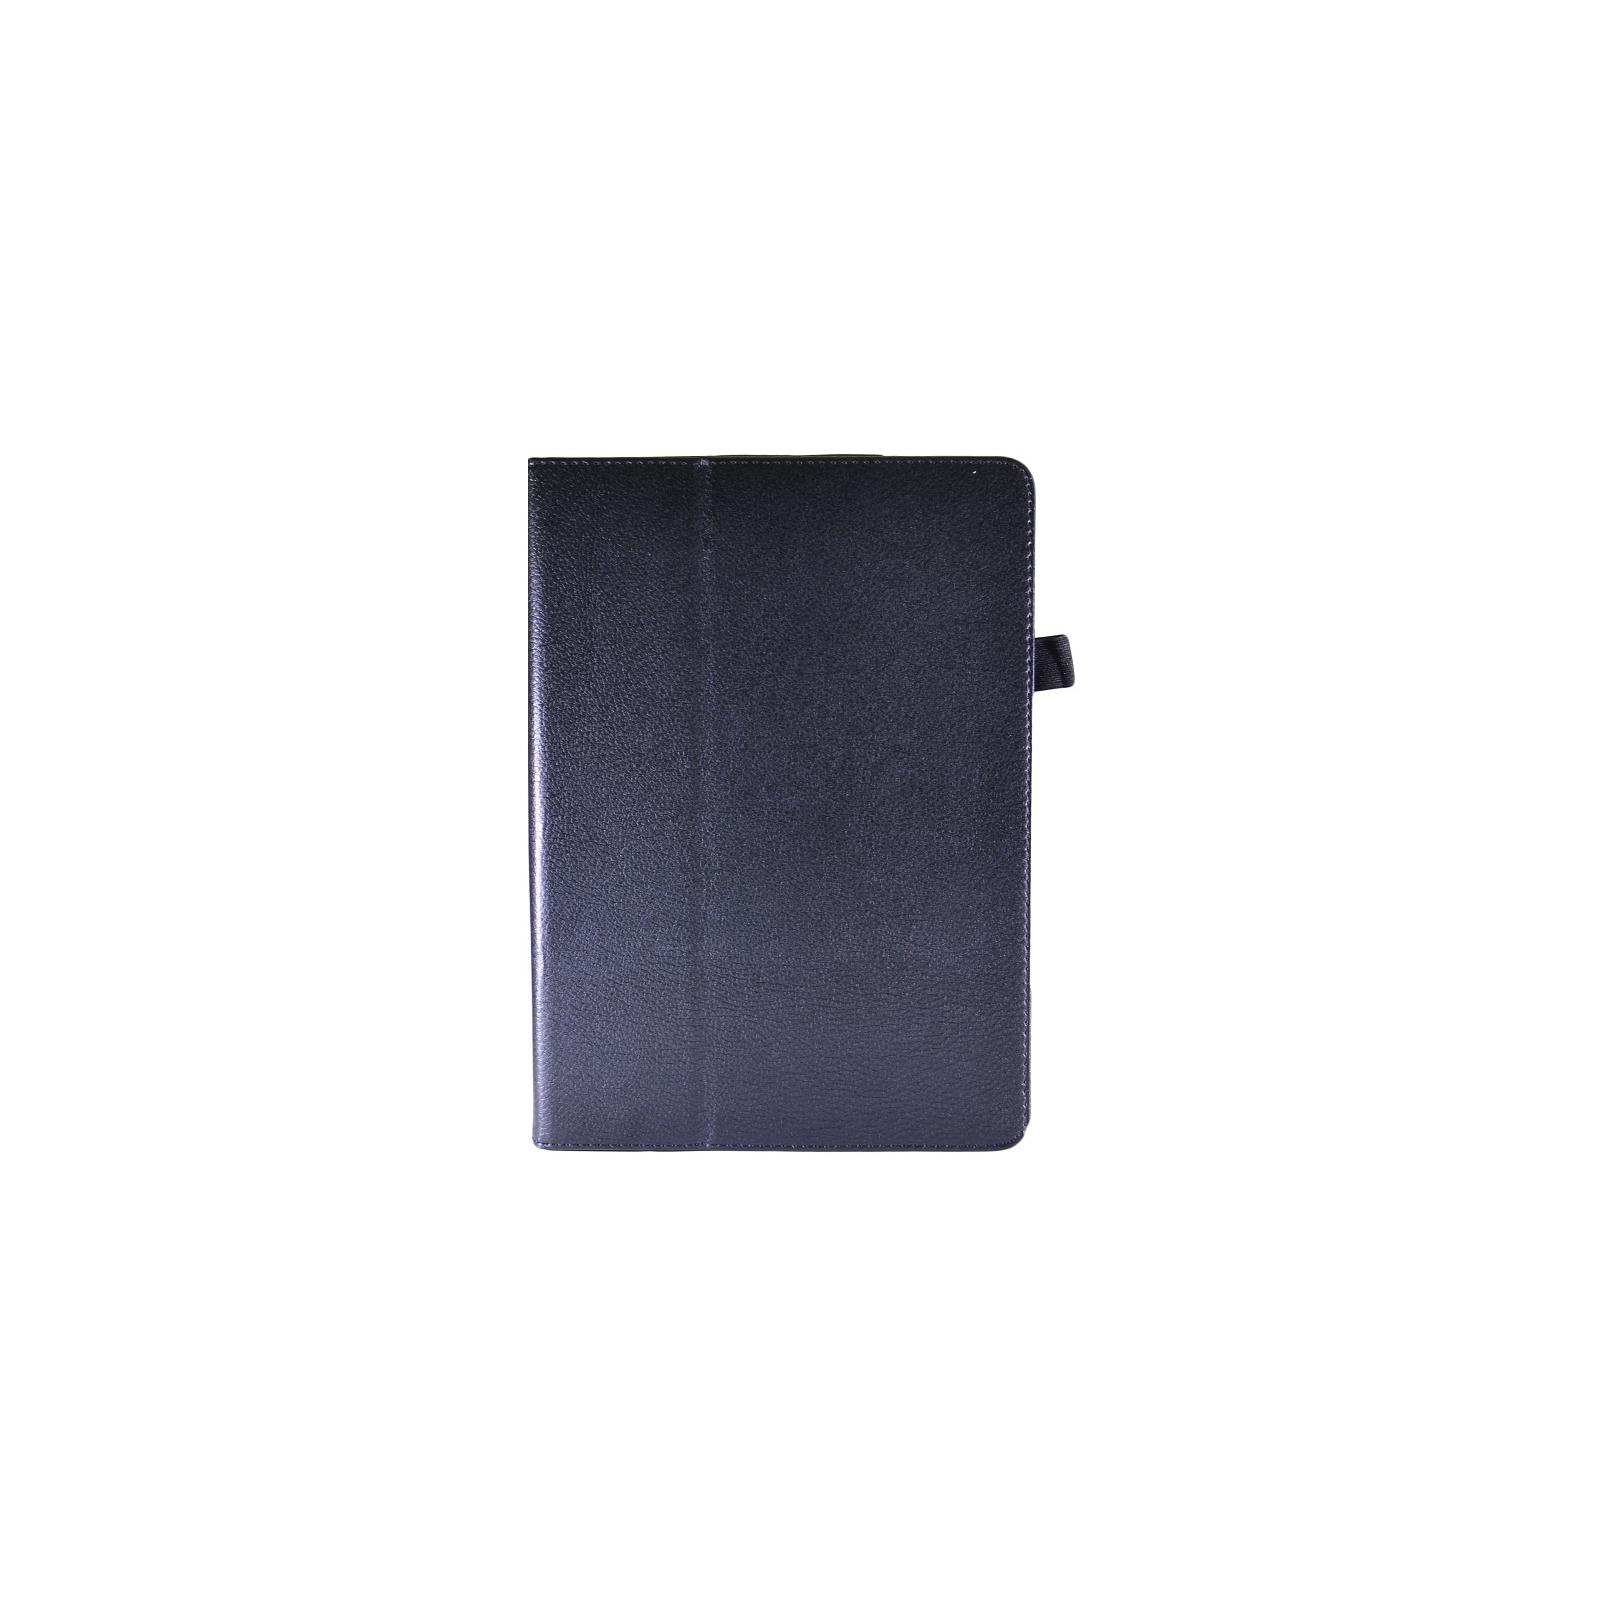 "Чехол для планшета Pro-case 10,5"" SM-T800 Galaxy Tab S 10.5 black (SM-T800b)"